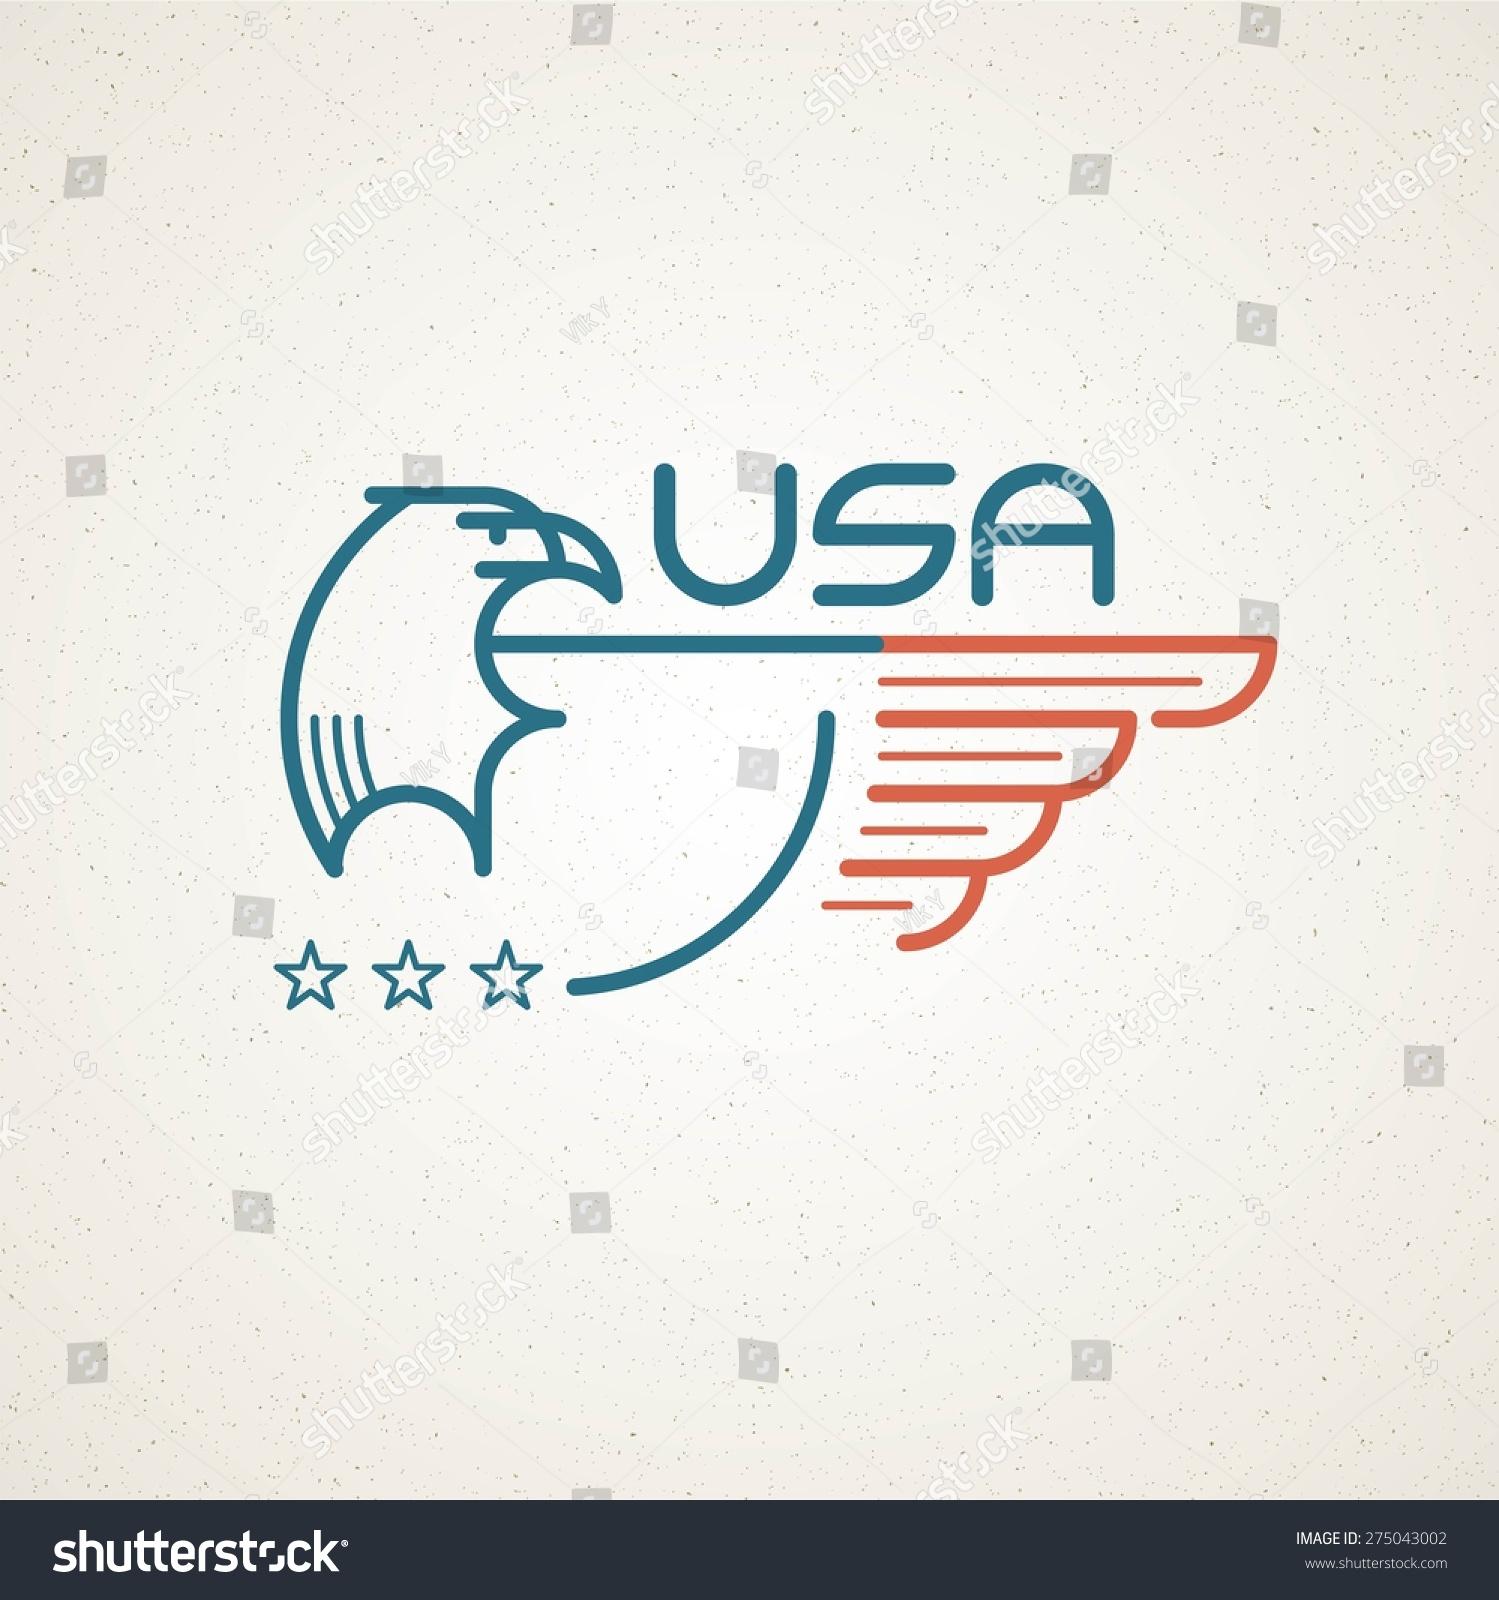 Made usa symbol american flag eagle stock vector 275043002 made in the usa symbol with american flag and eagle templates emblems vector illustration buycottarizona